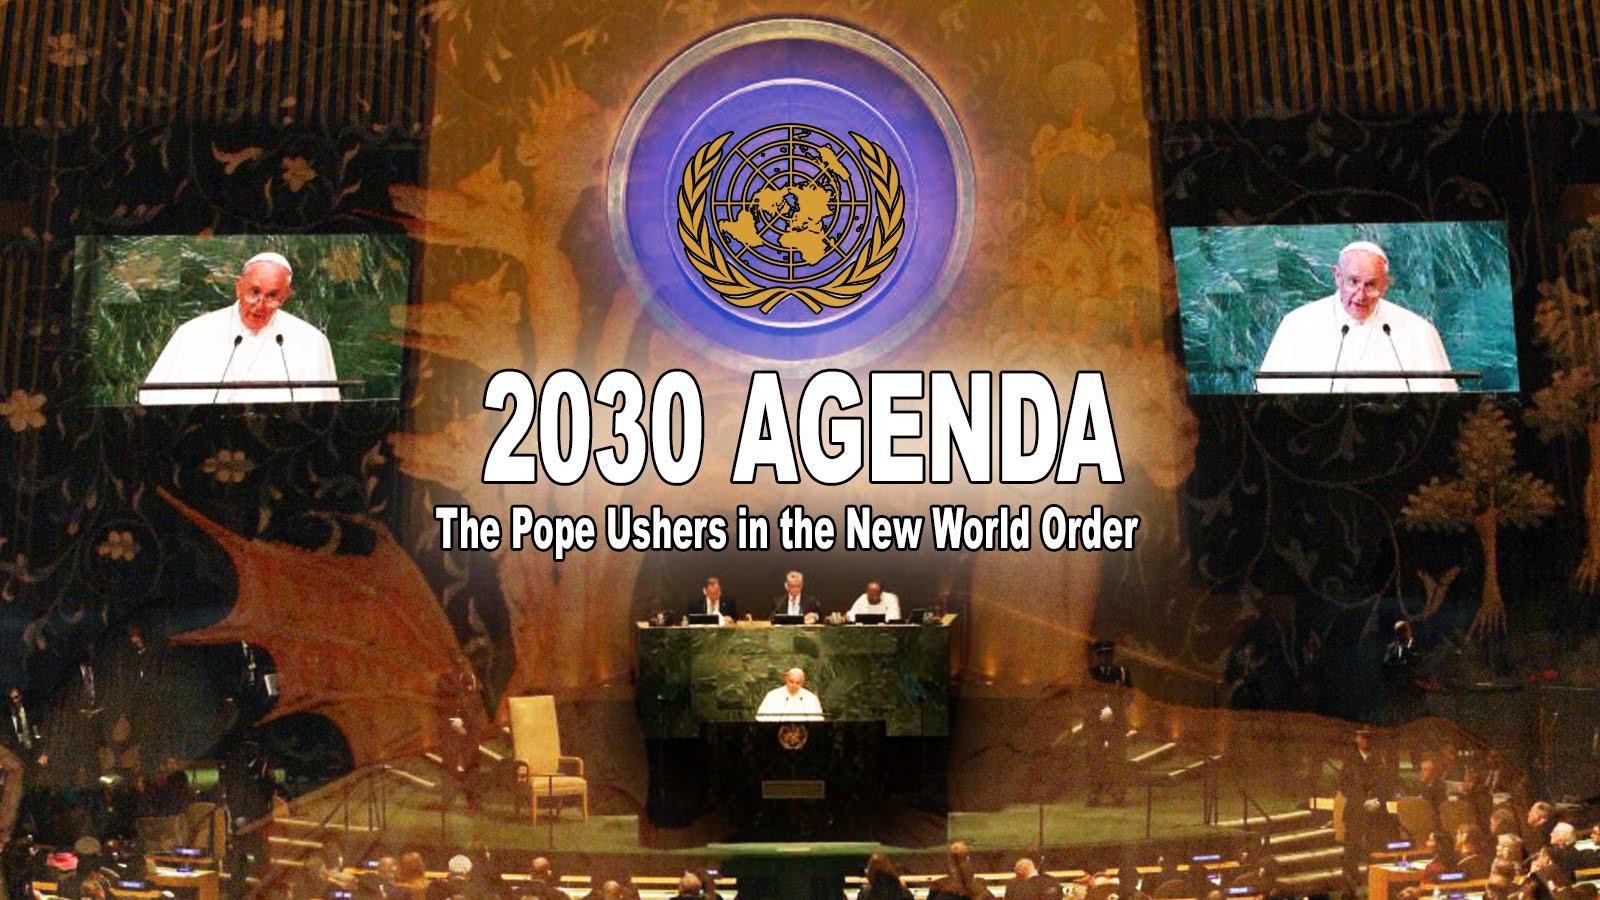 Agenda_2030-Bergoglio